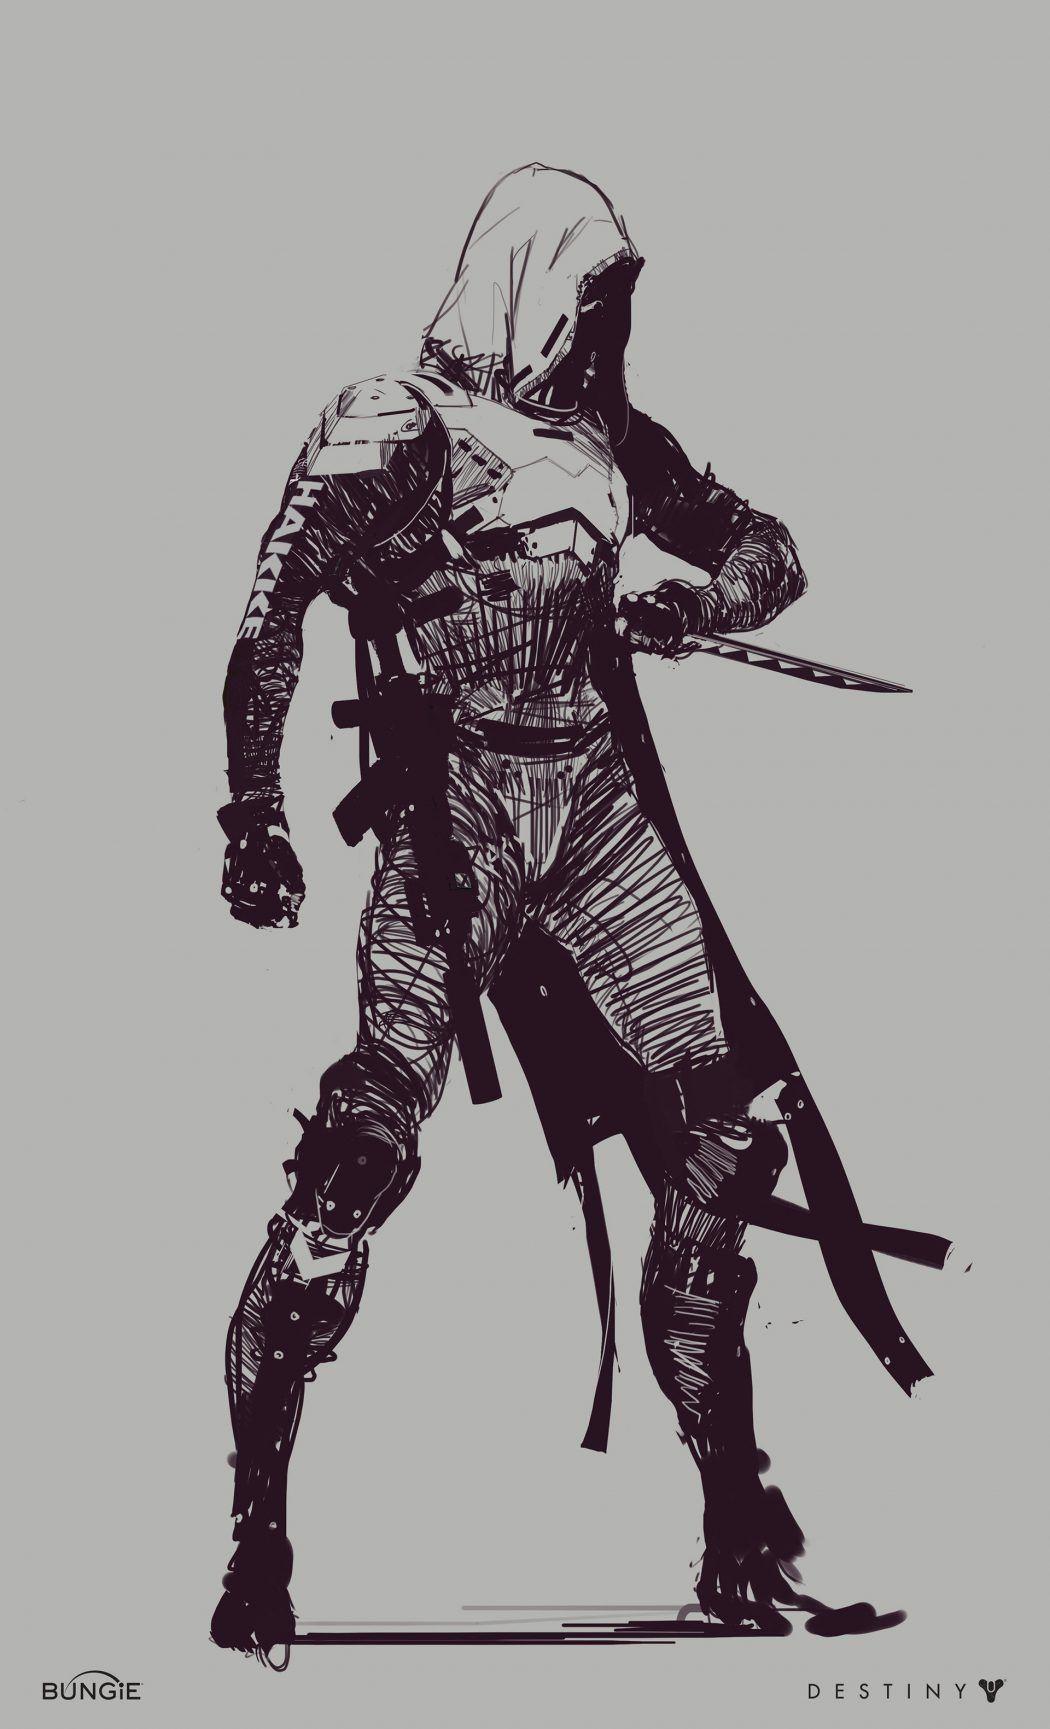 Destiny 2 Concept Art By Ryan Demita Concept Art Pinterest